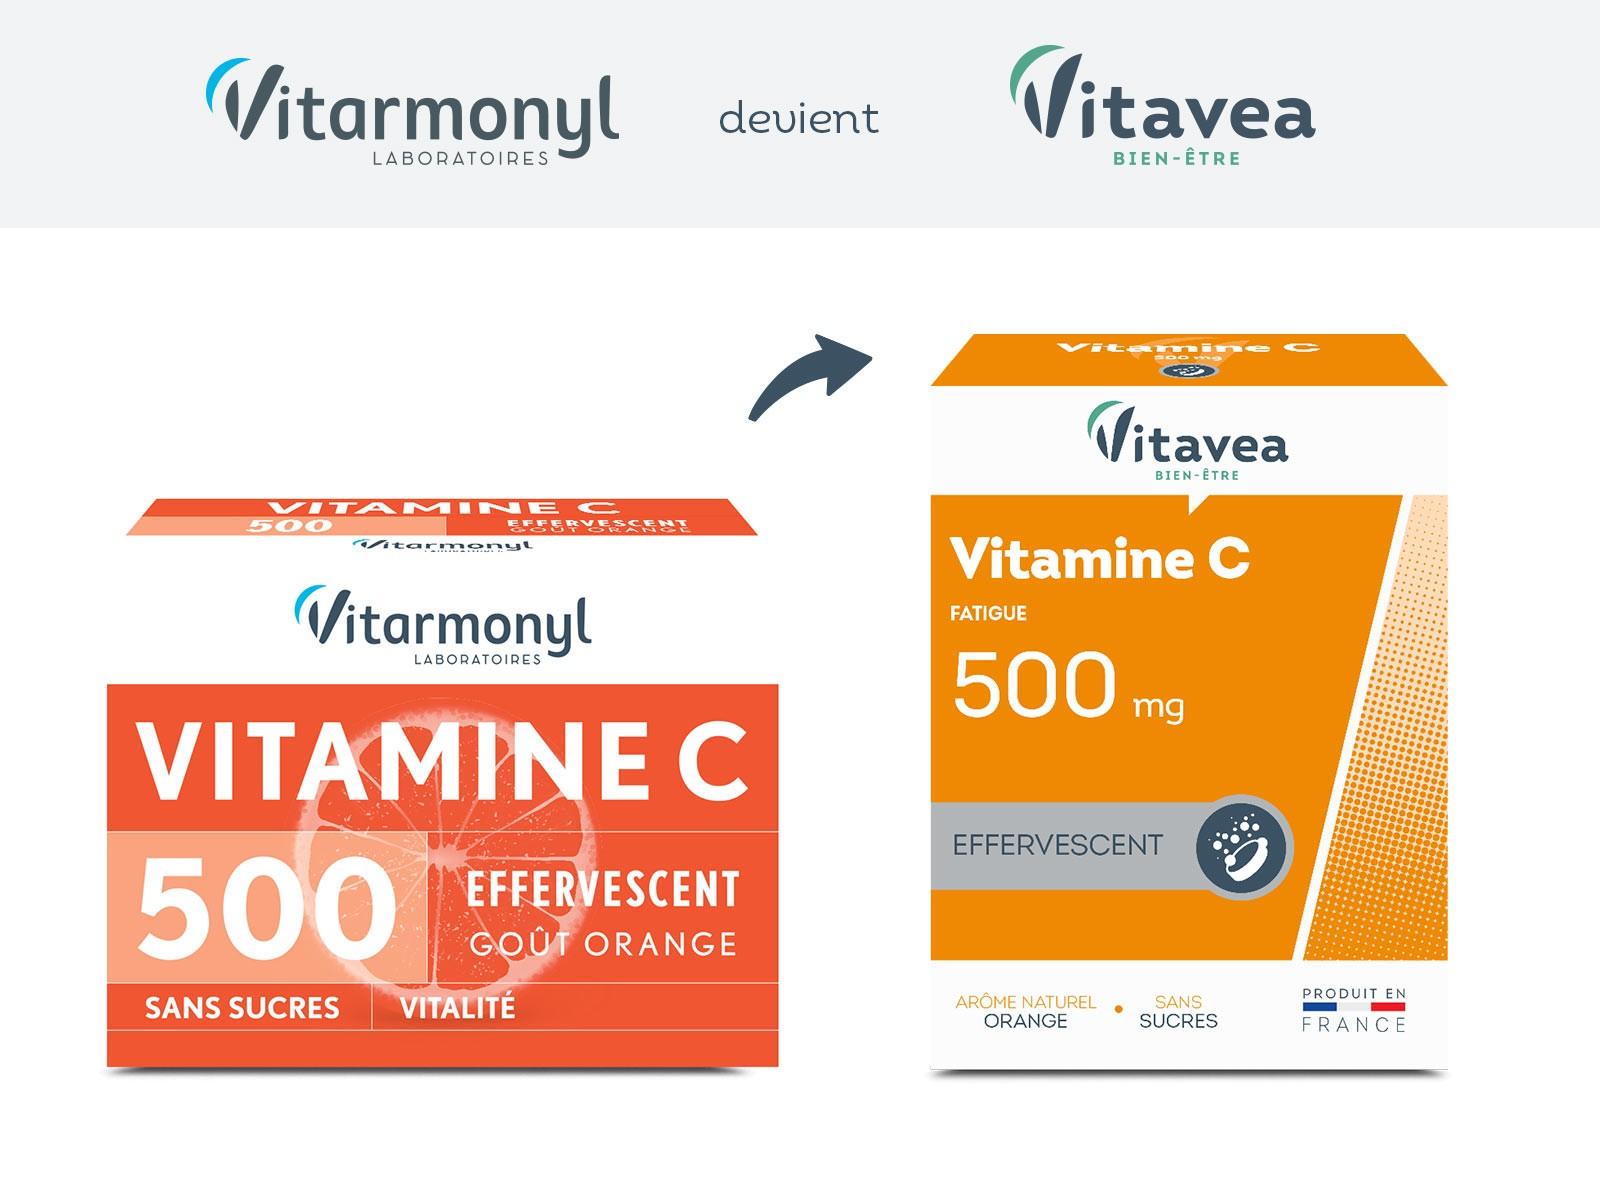 Image Vitamine C 500 – Effervescent